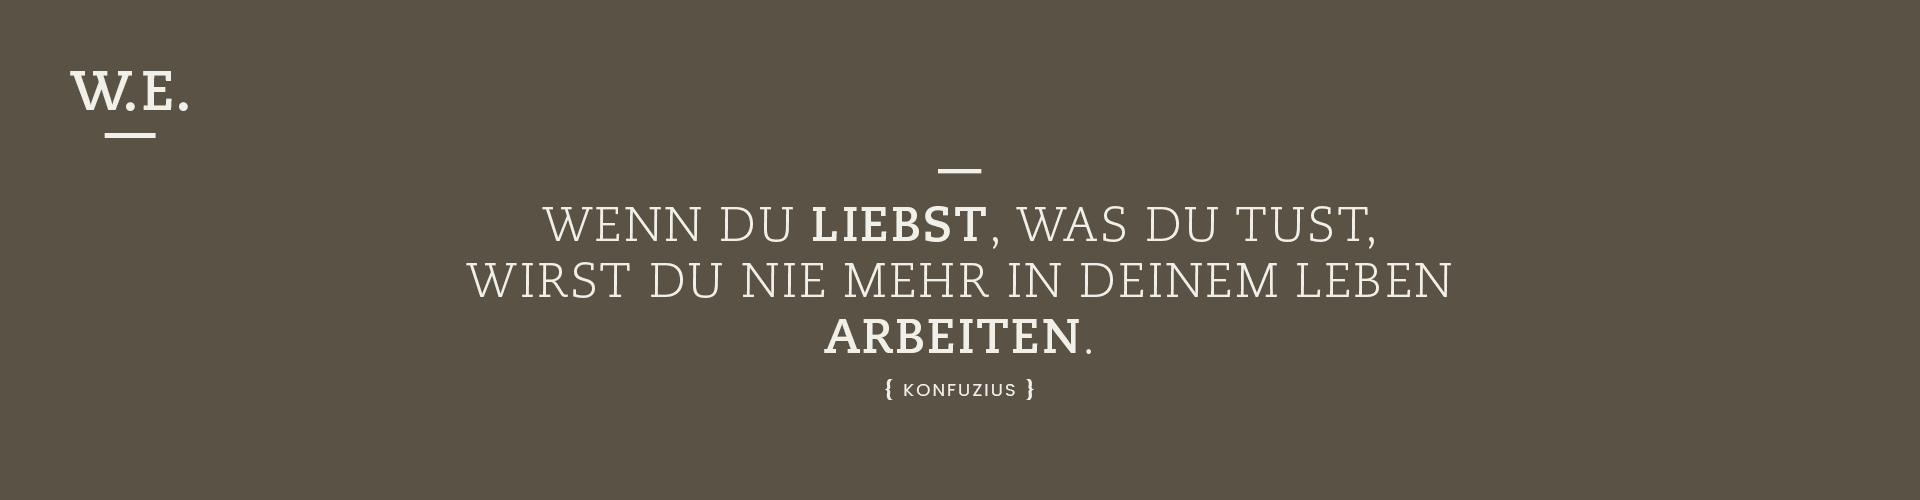 WE_konfuzius_schmal